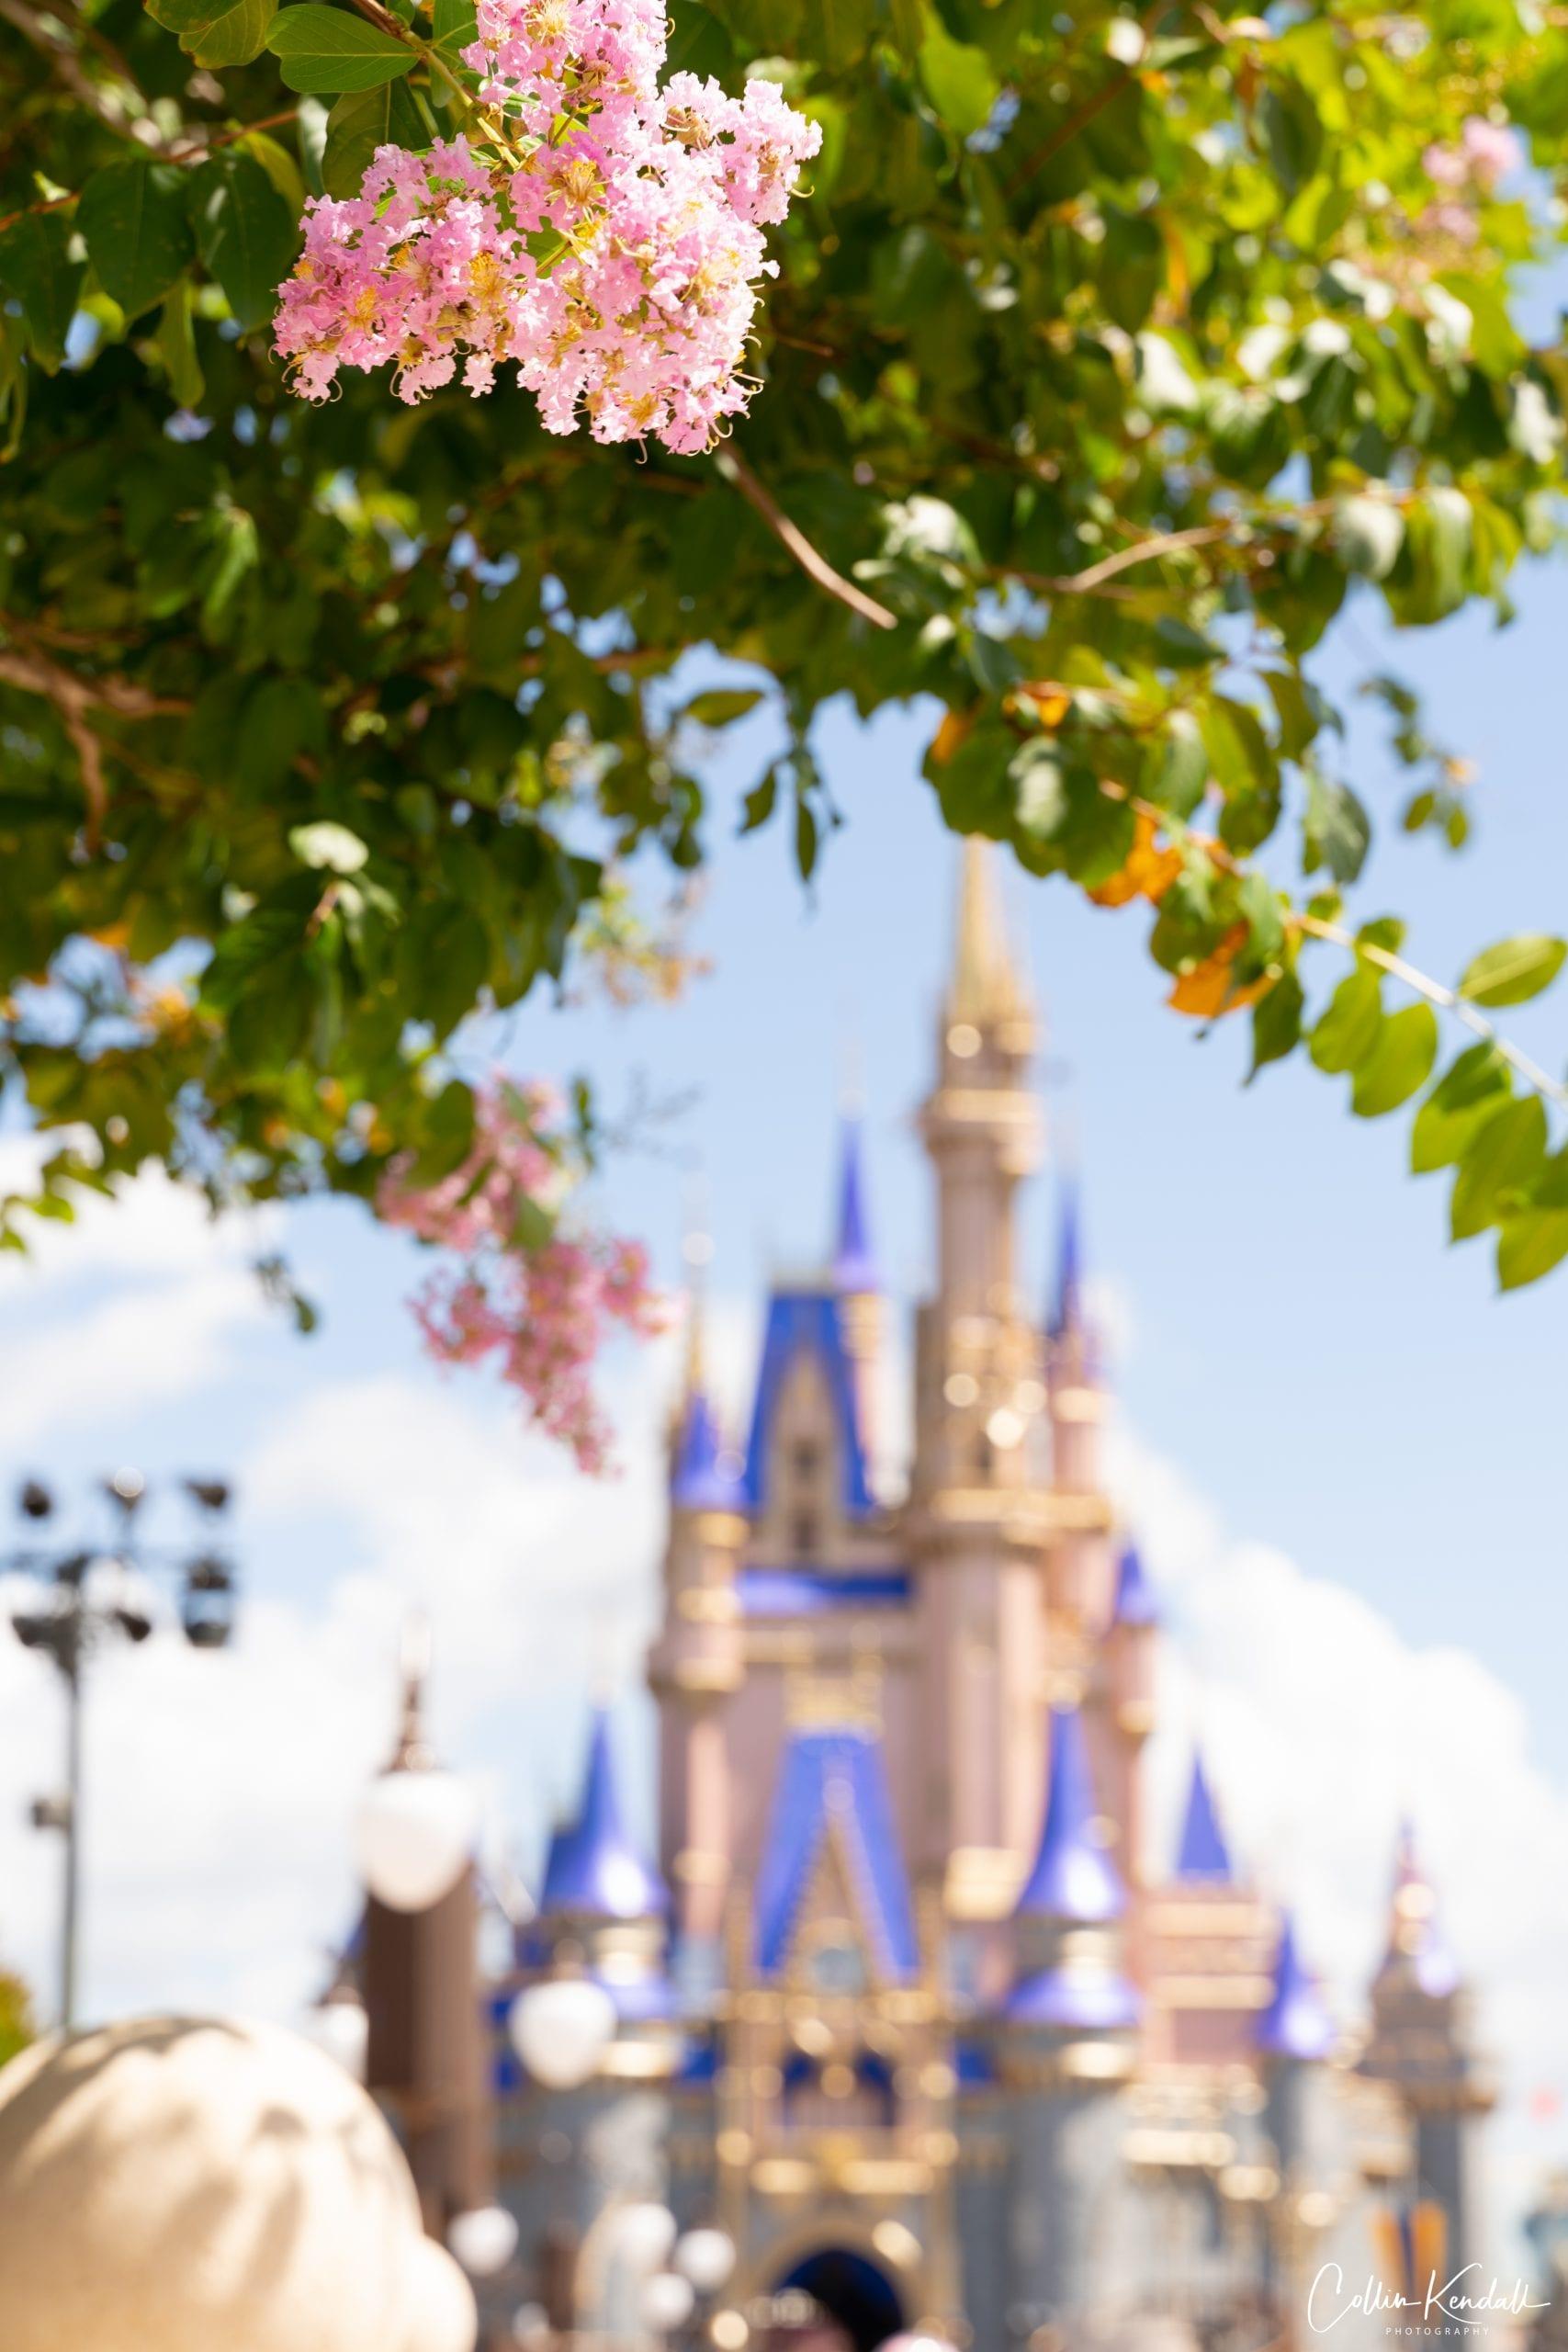 Disney World's new castle design is unveiled